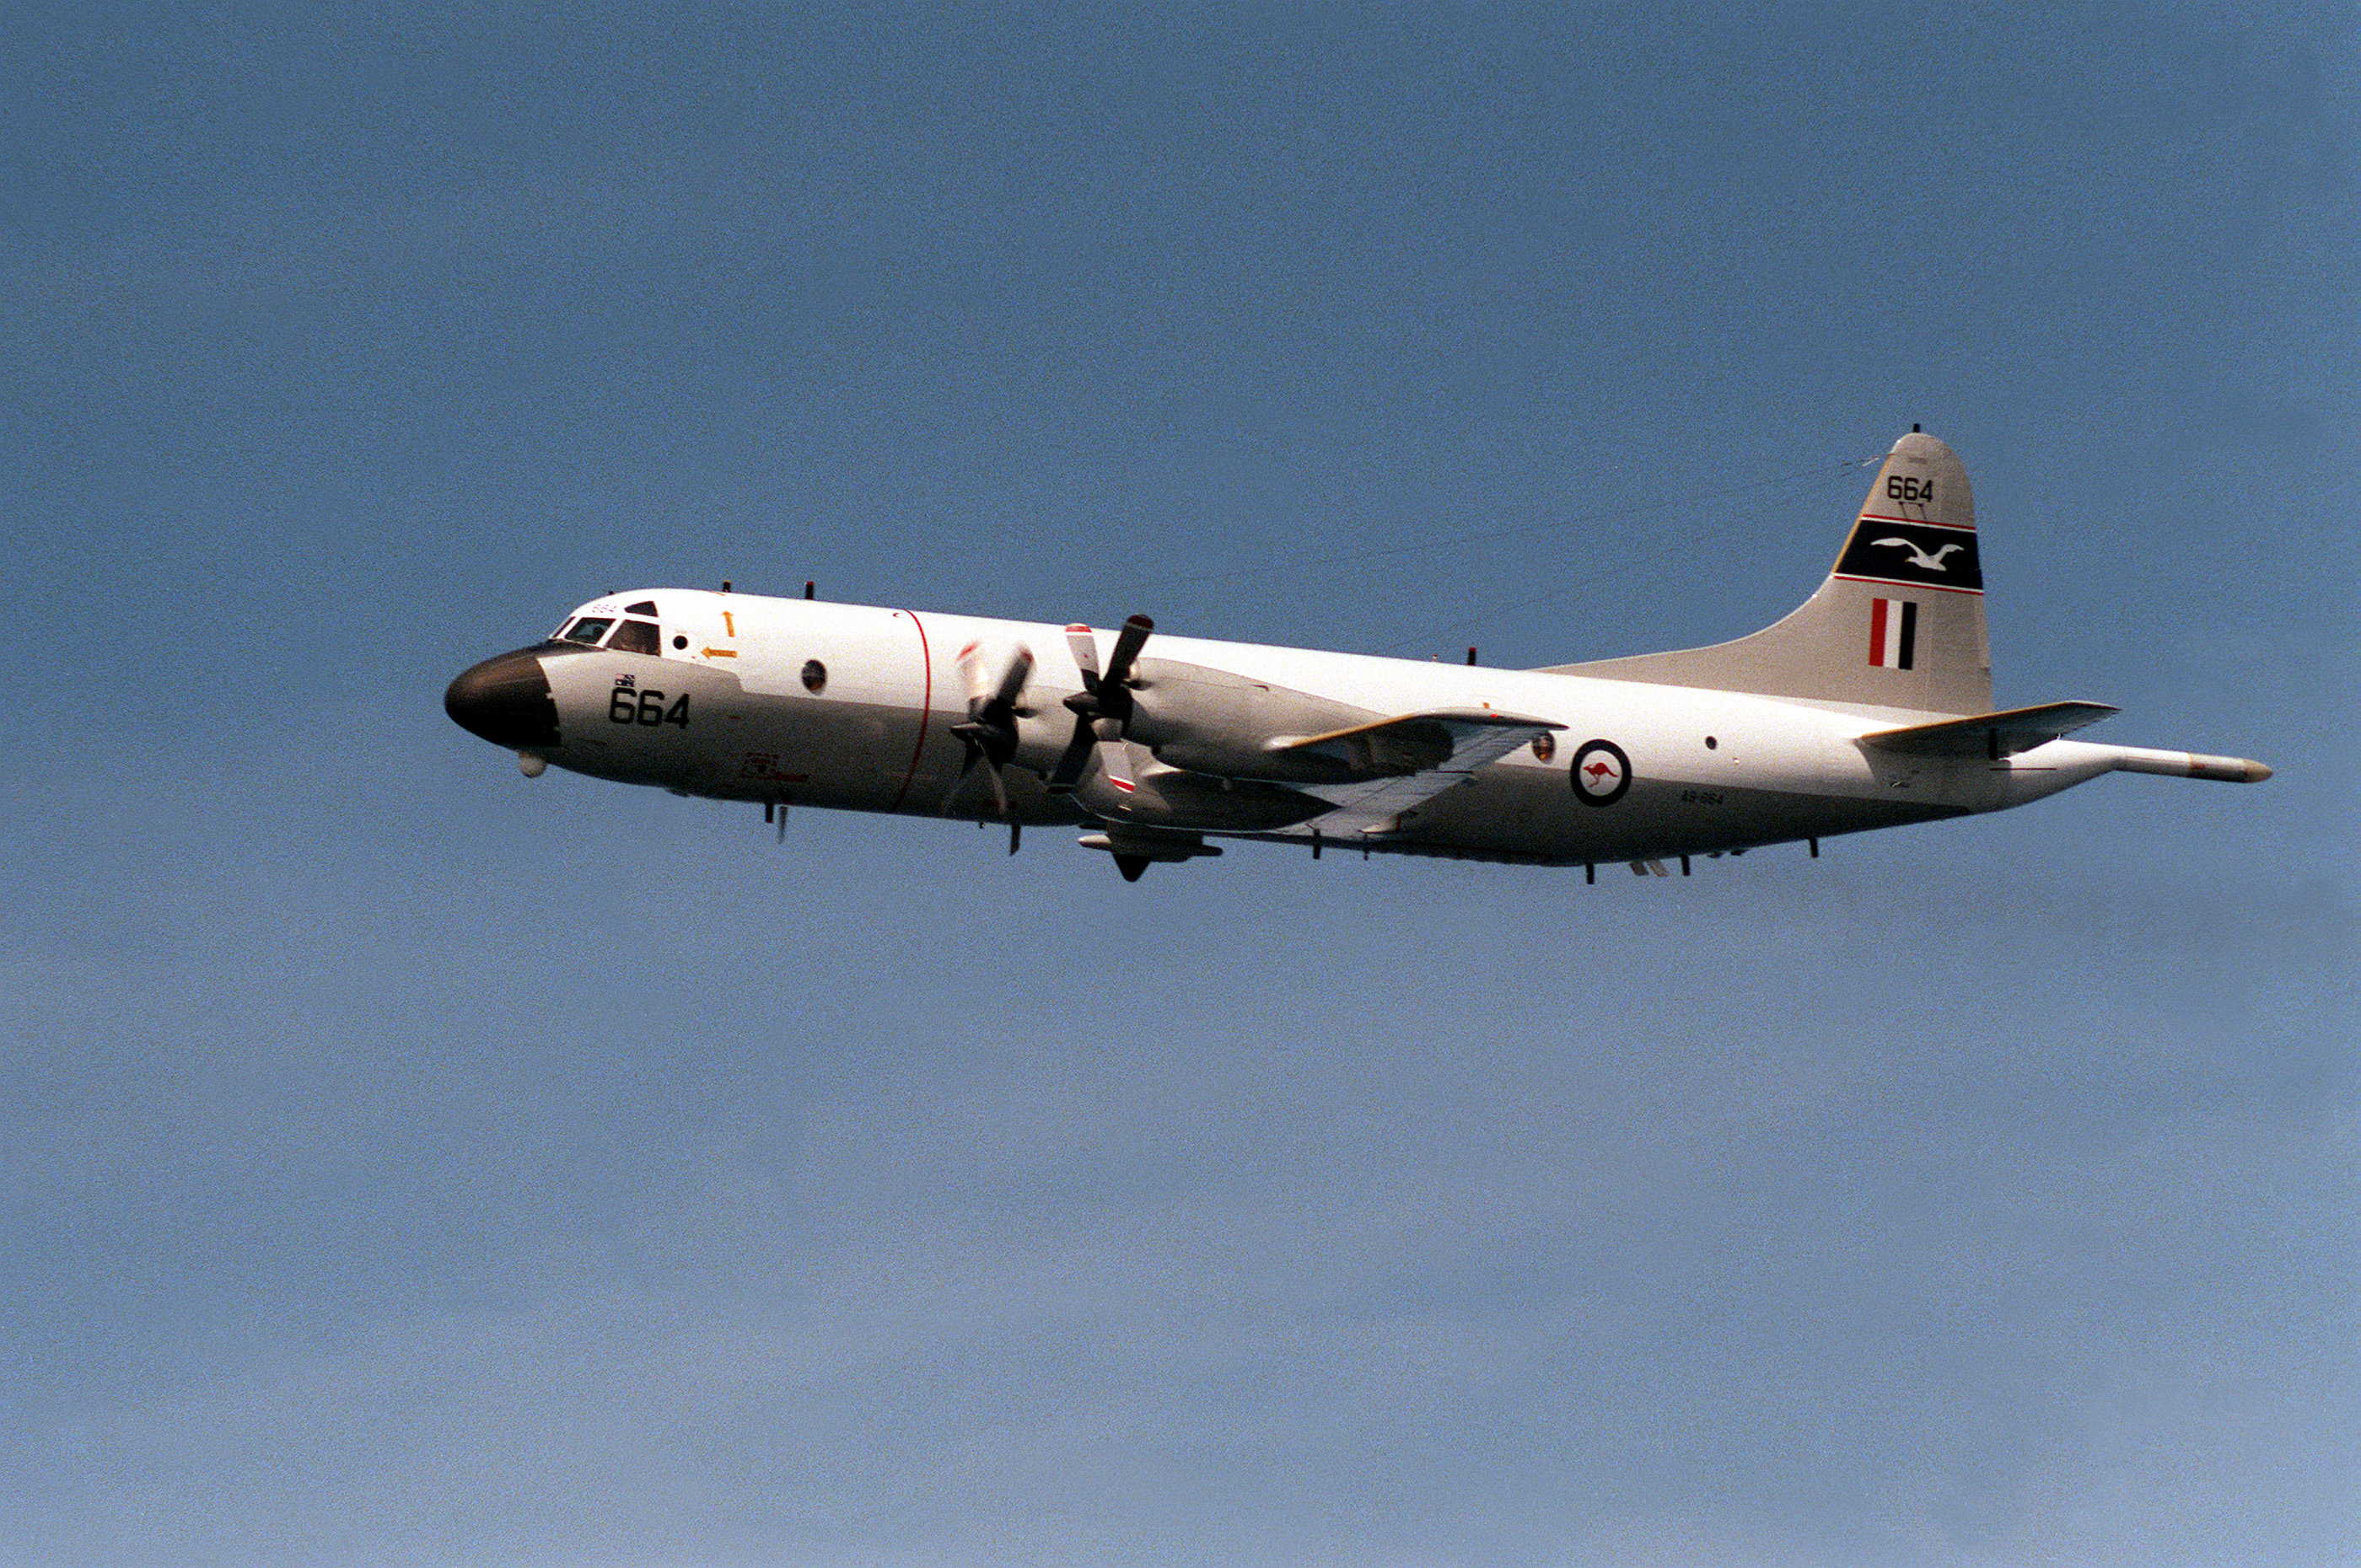 Lockheed P 3 Orion Wikipedia Mad Max Engine Diagram 3c 11 Sqn Raaf In 1990